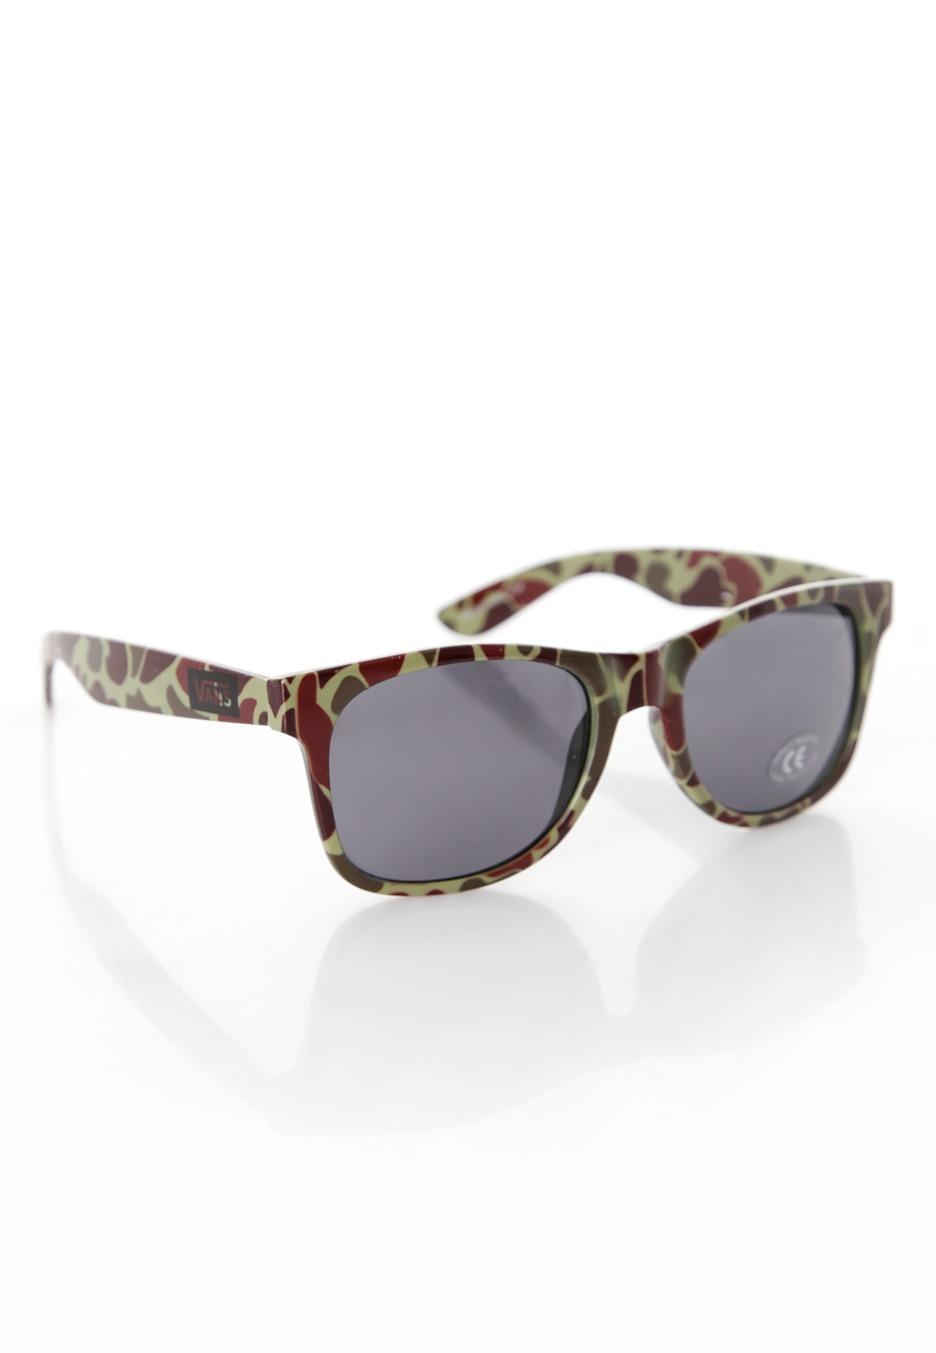 5dd31d78ab Vans - Spicoli 4 Shades Classic Camo - Sunglasses - Impericon.com AU